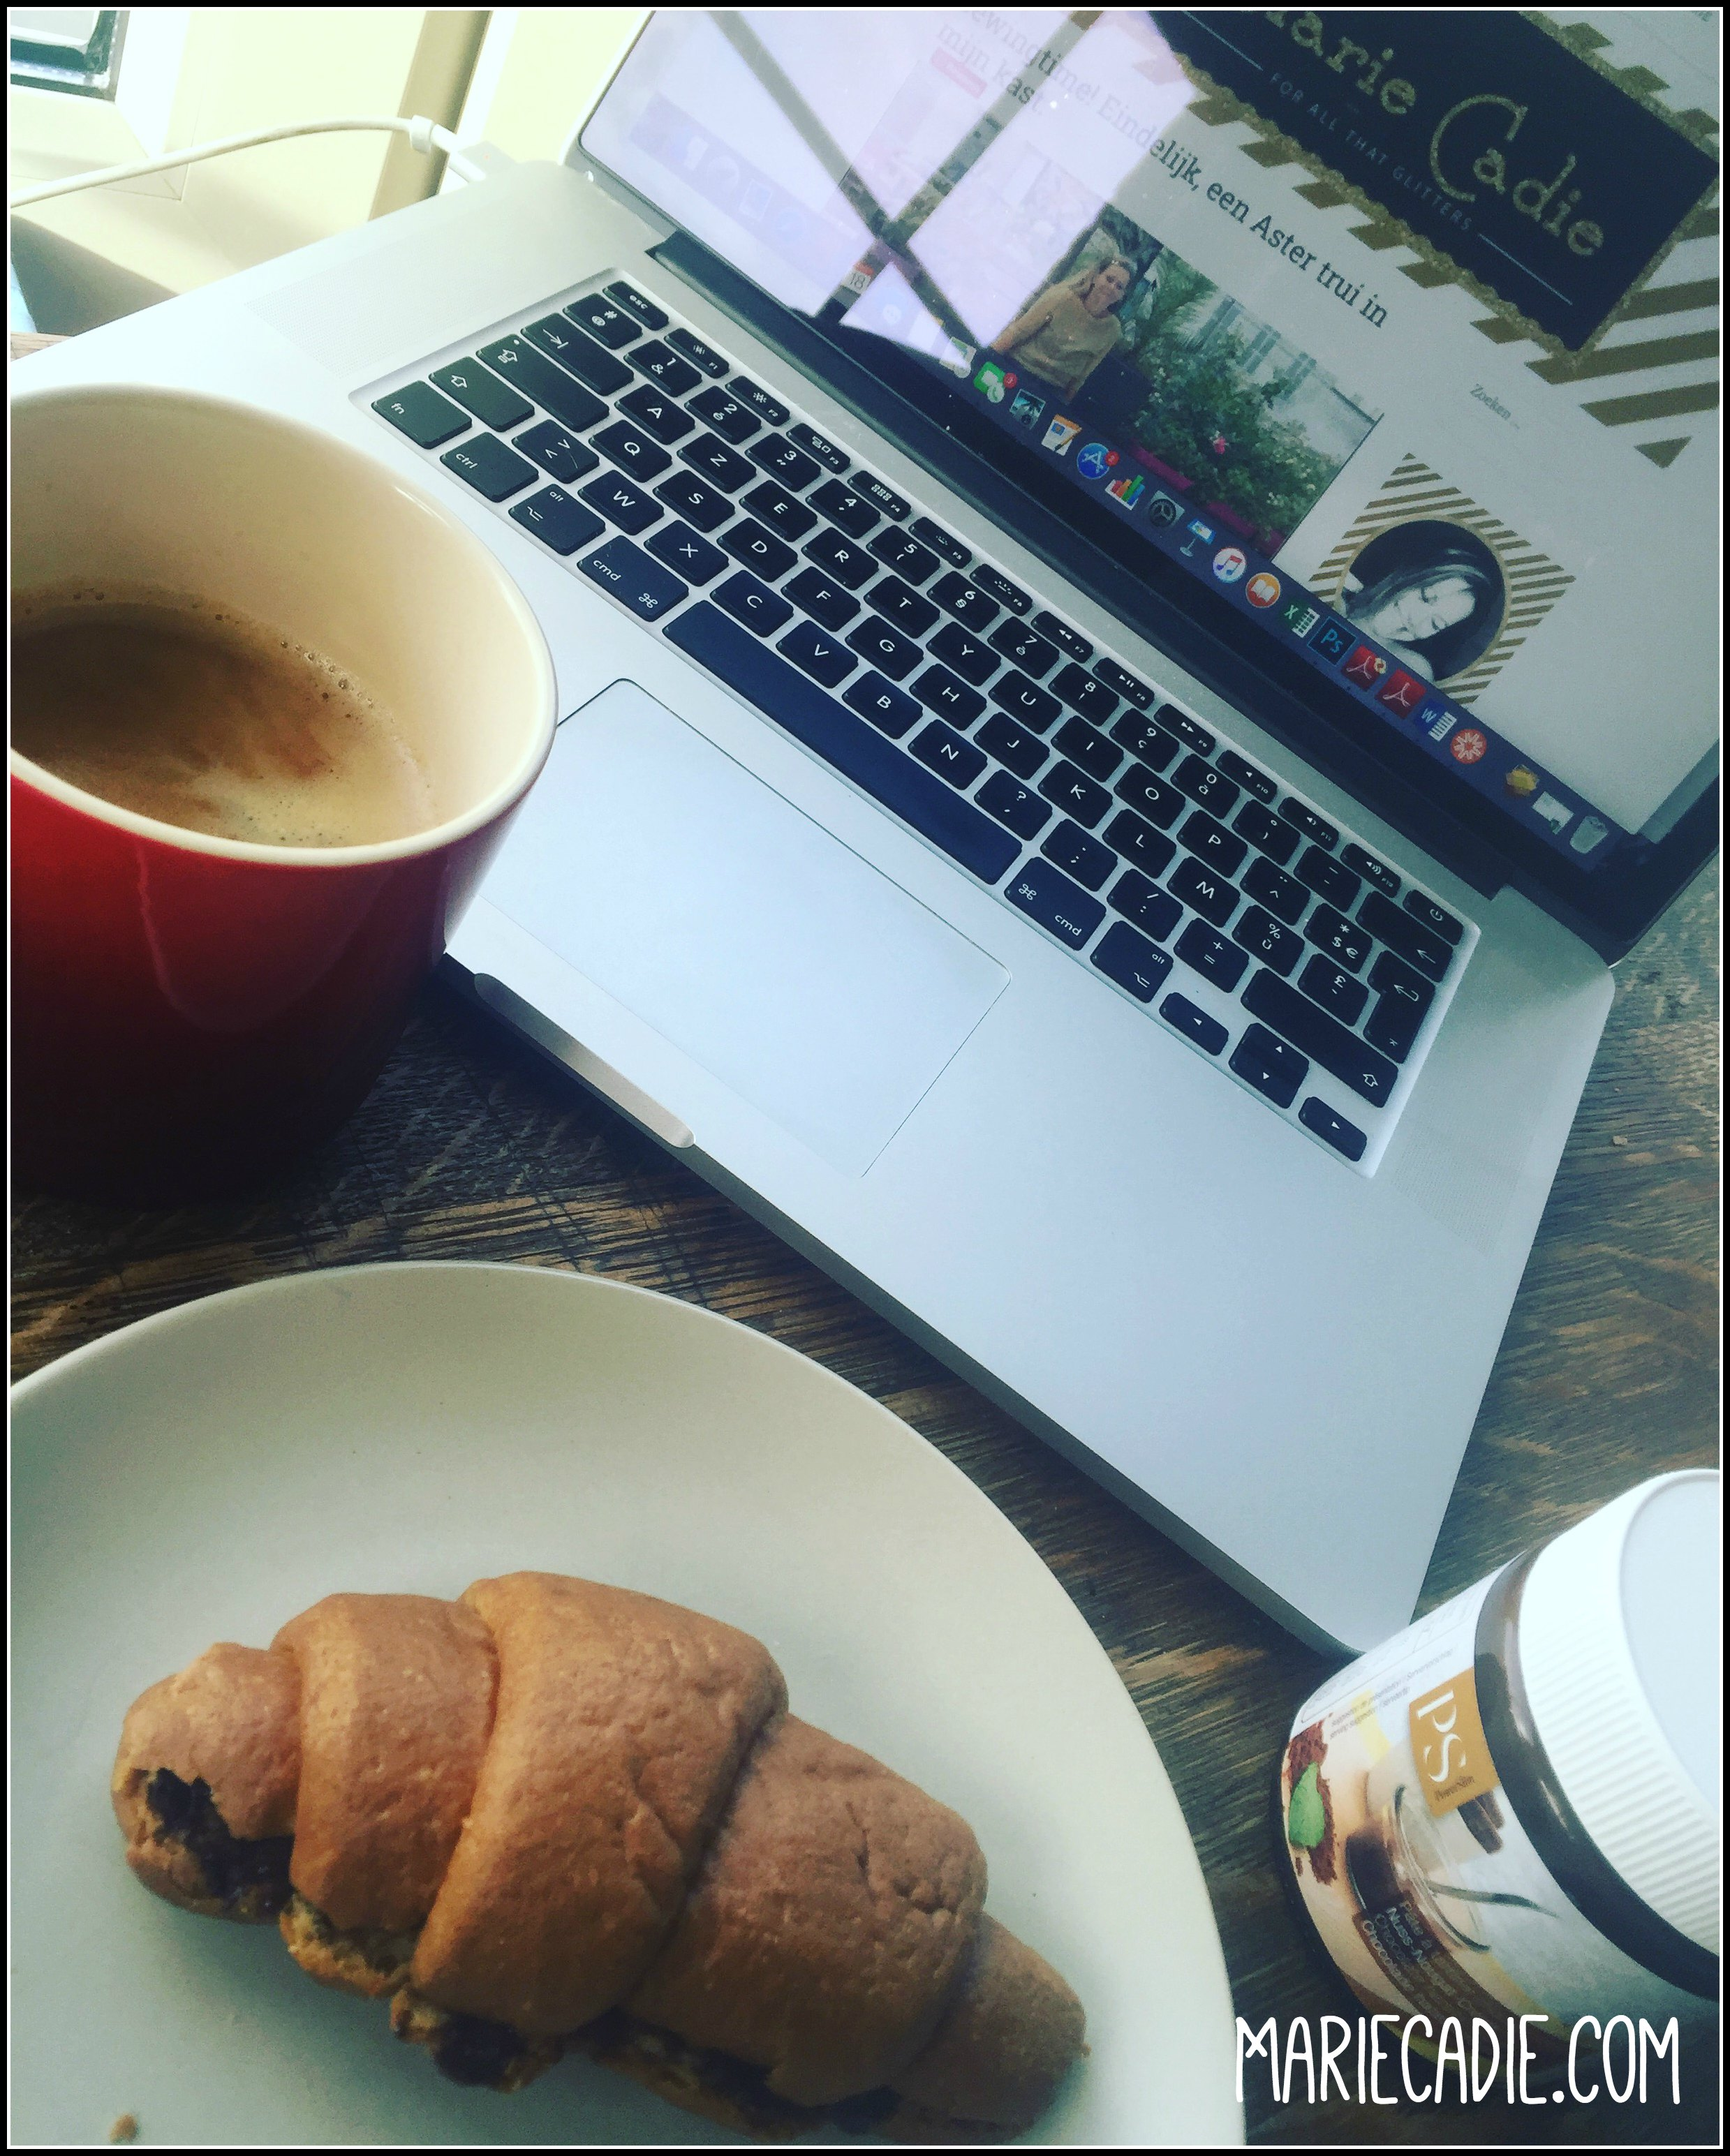 MarieCadie.com Powerslim ontbijt croissant choco.jpg